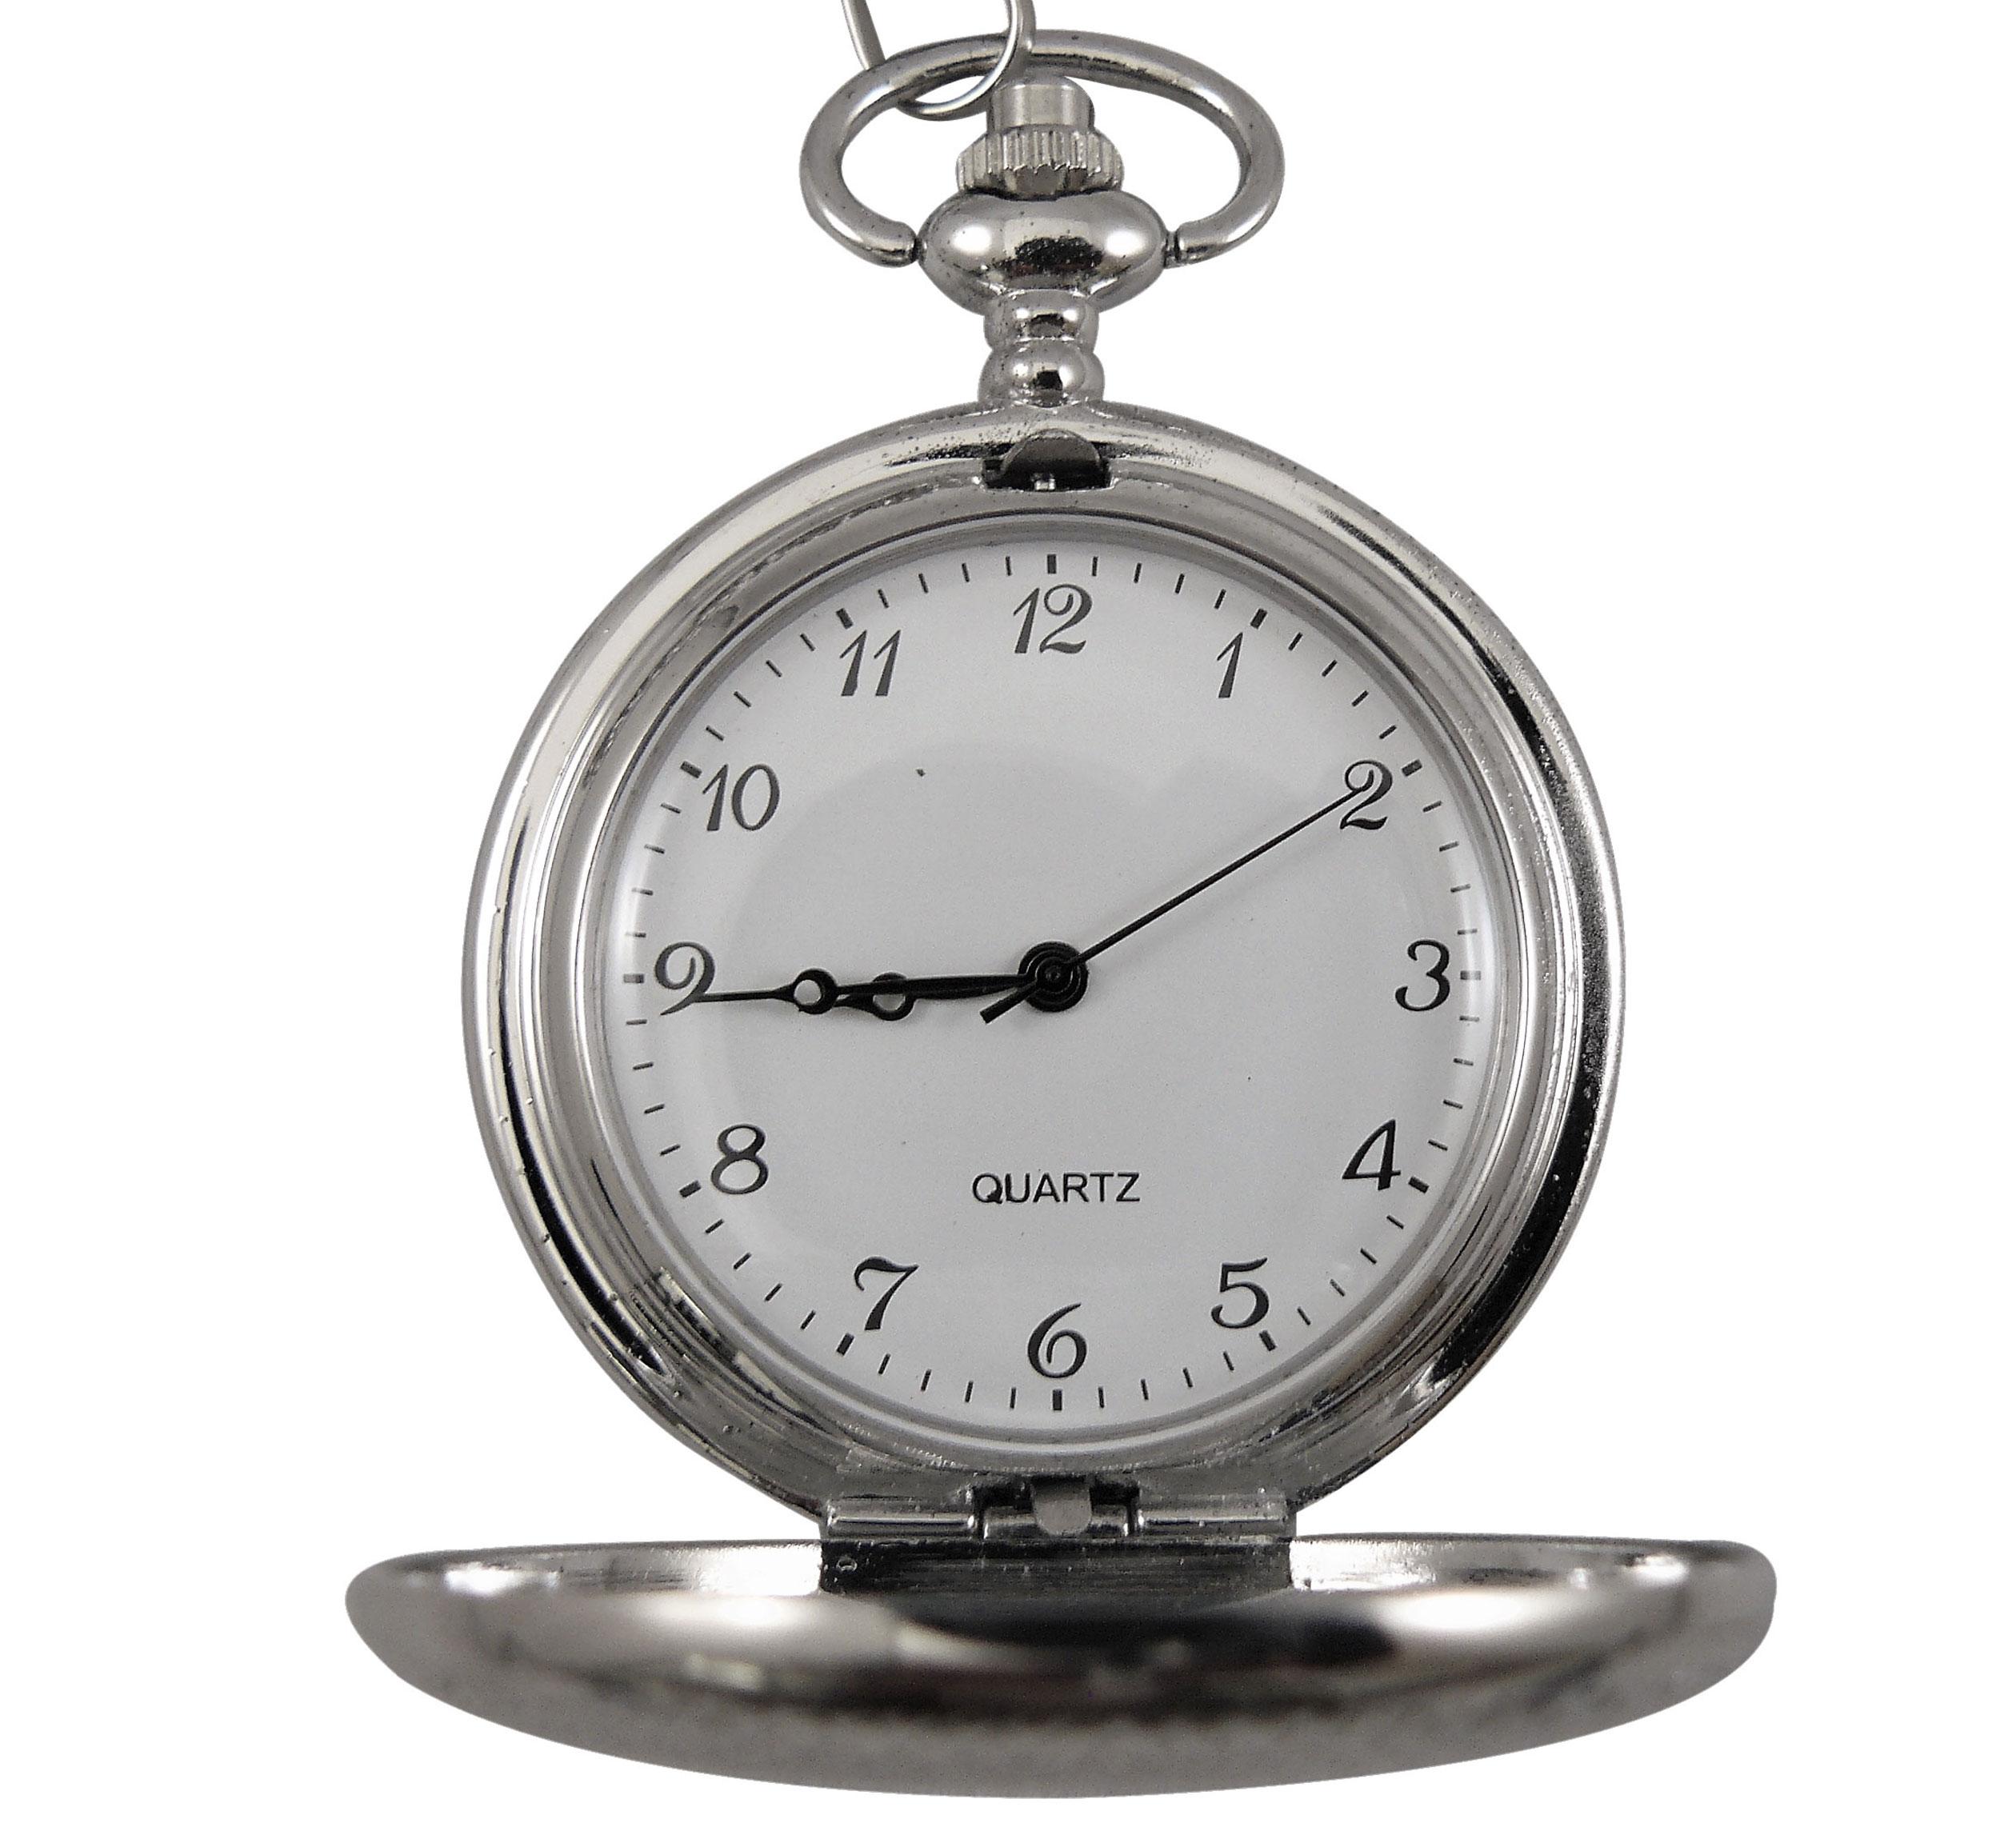 QUARTZ Ρολόι Τσέπης με Αλυσίδα  407b457fb4c